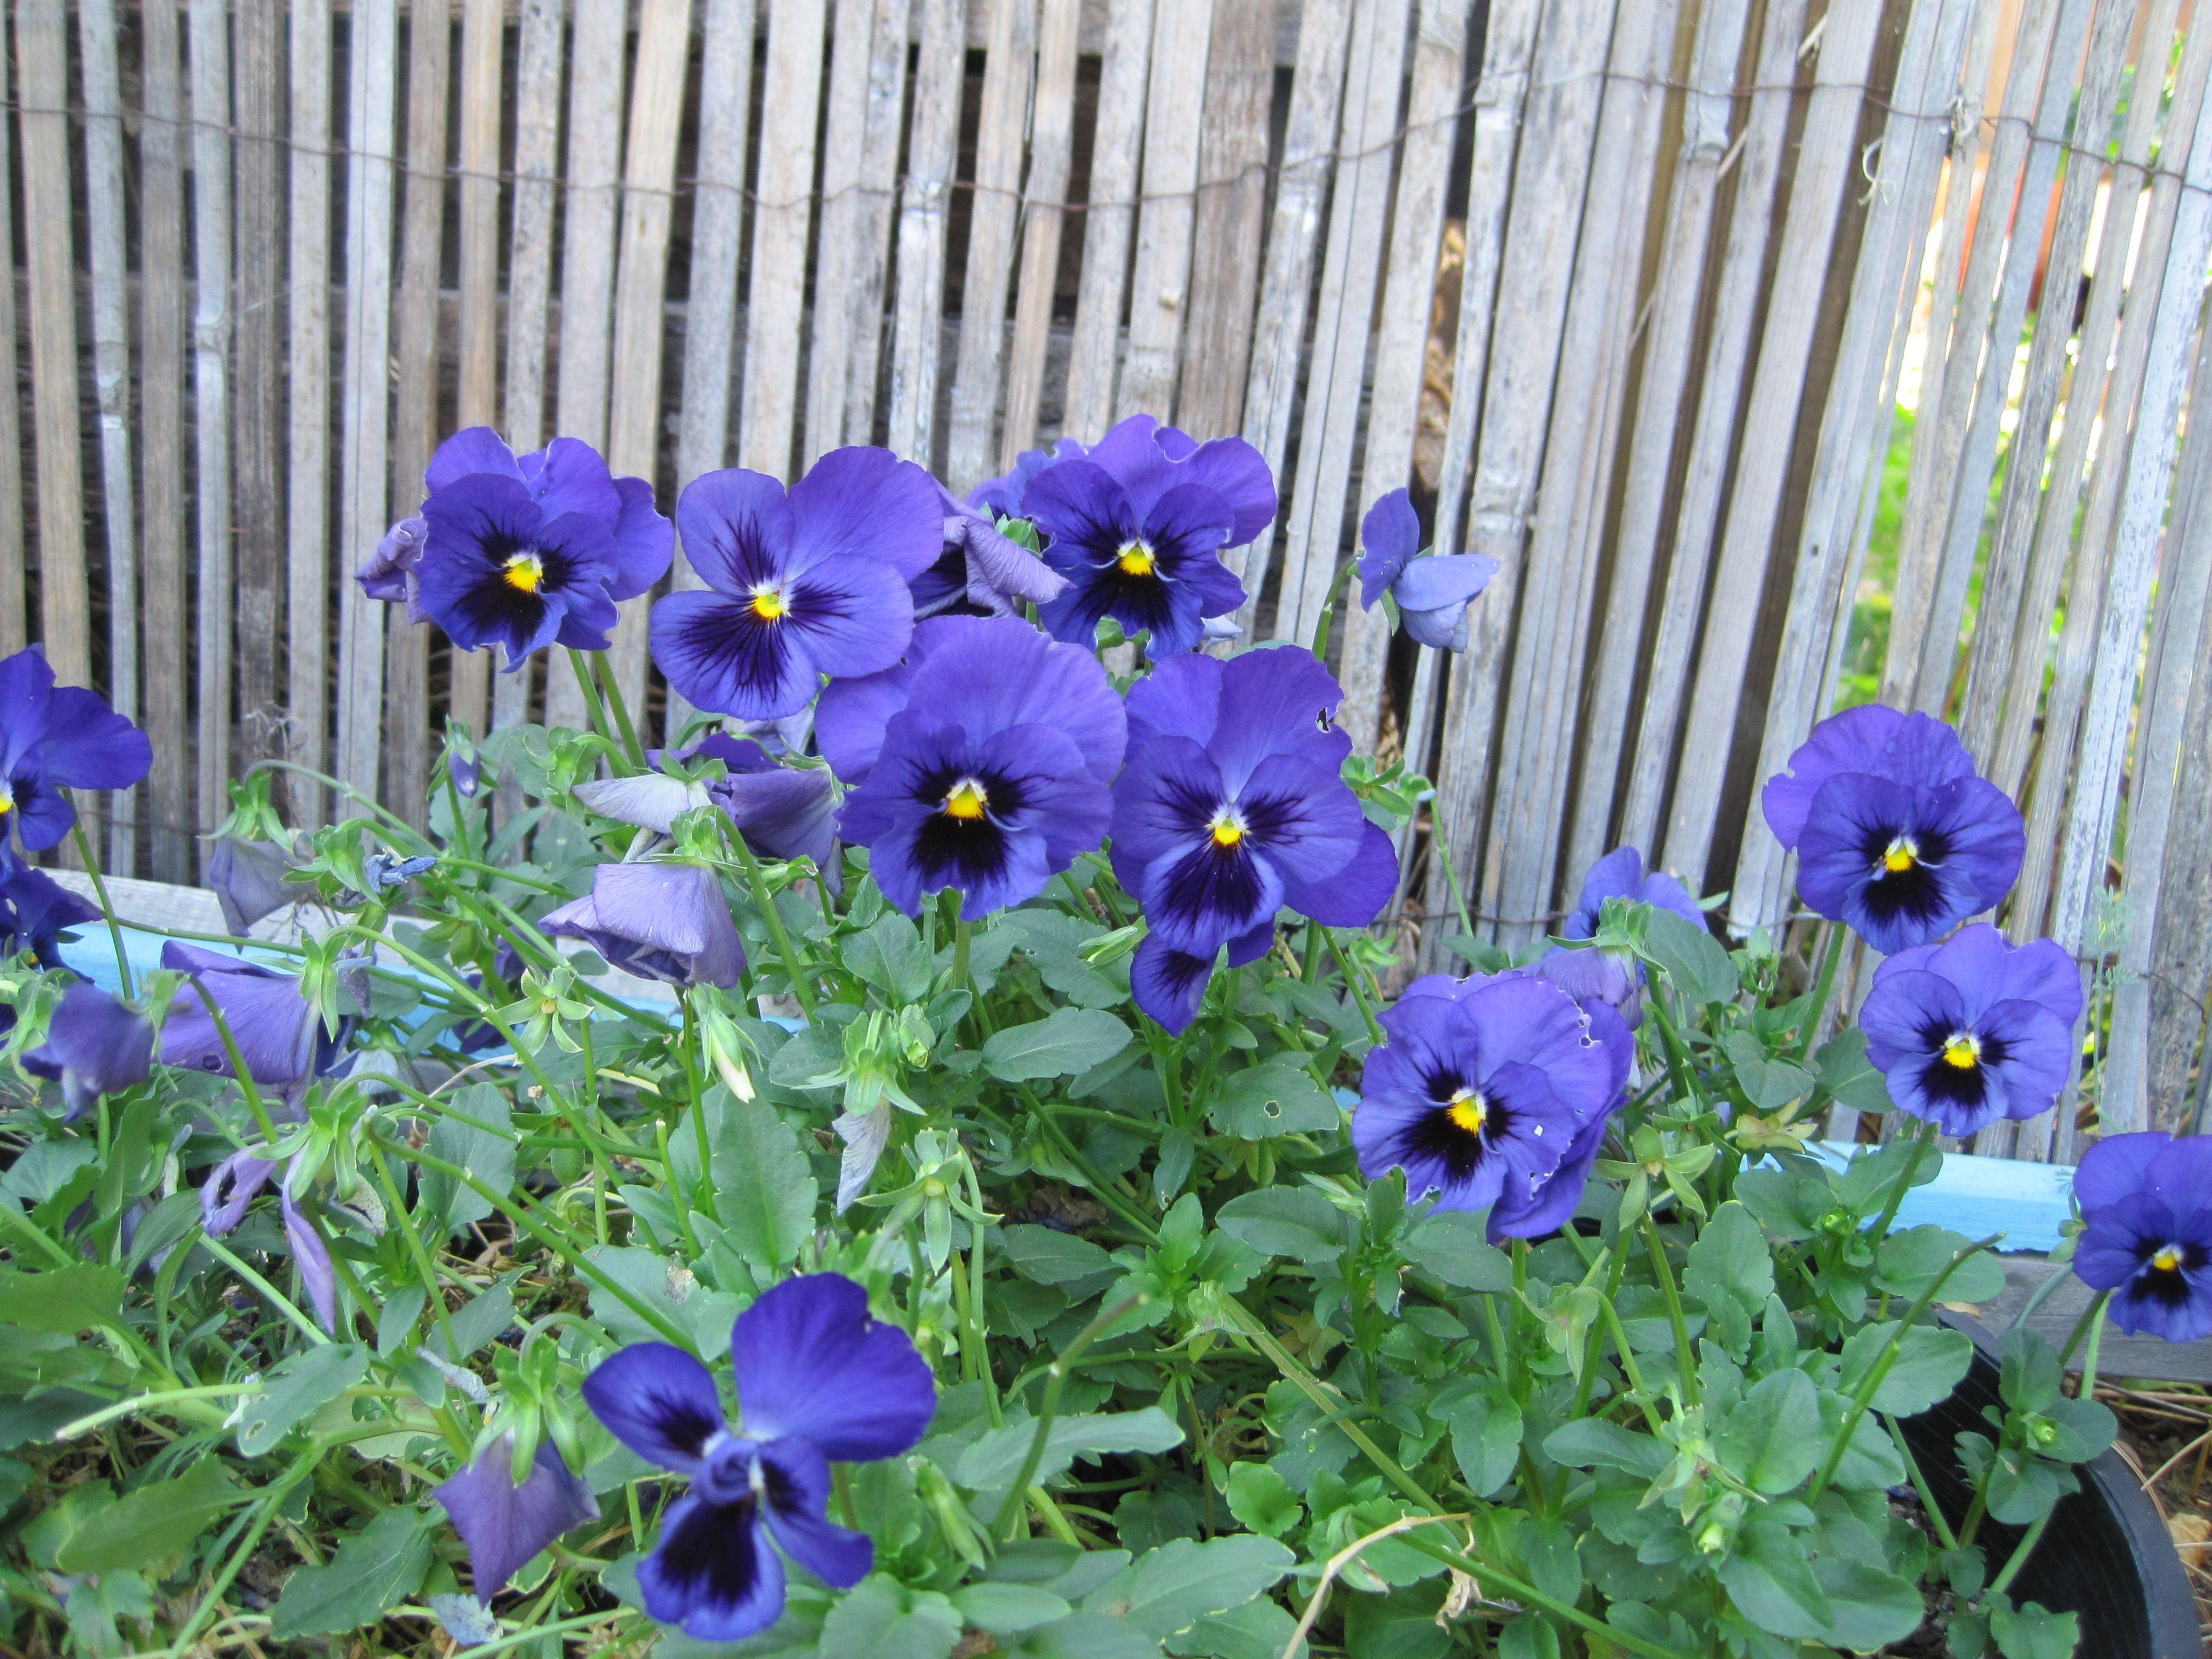 Johnny jump ups or heartsee charming edible flower grows